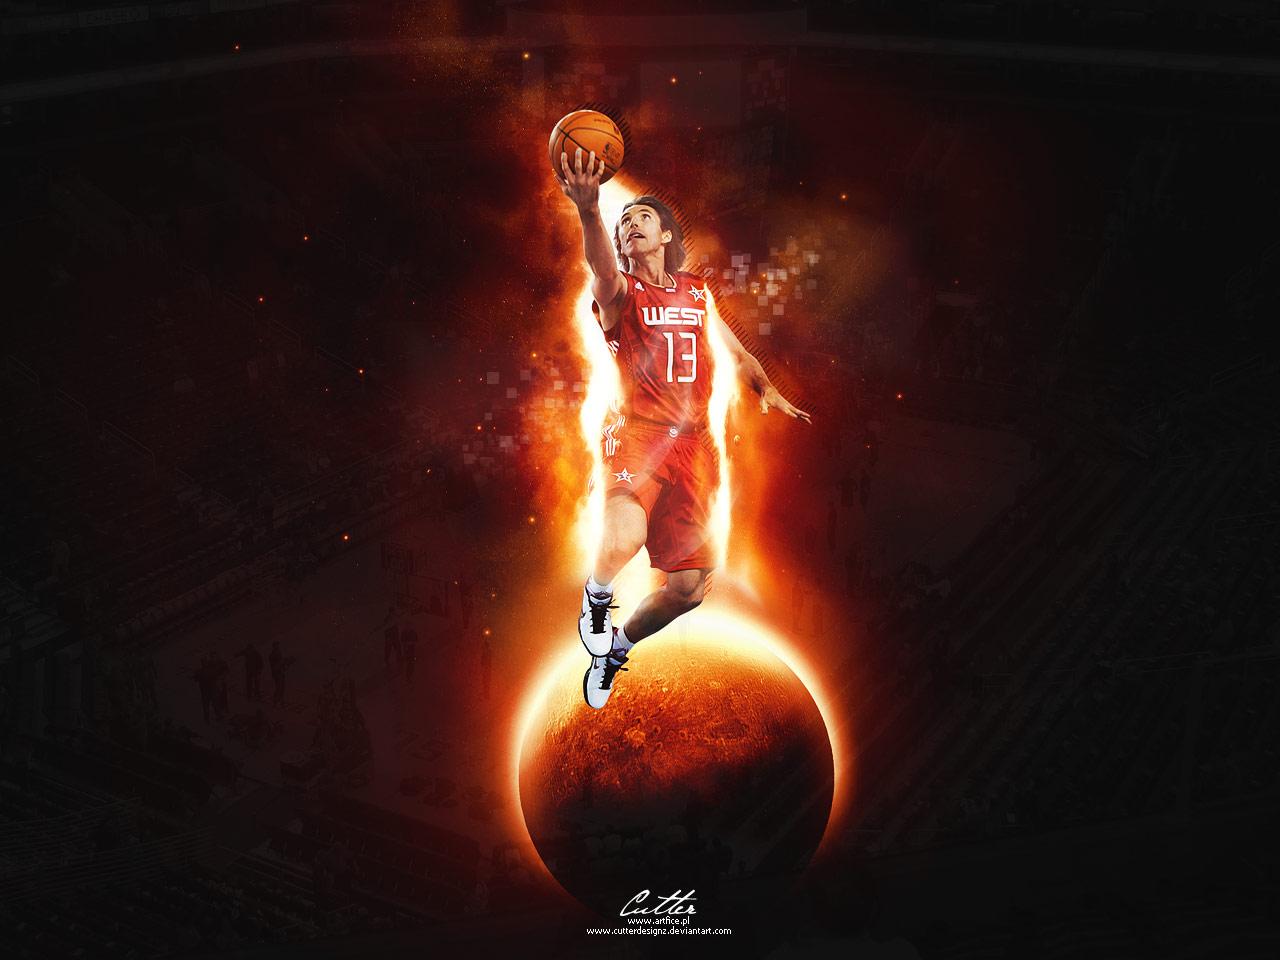 Steve Nash Wallpaper in the 2010 All Star Game NBA 1280x960